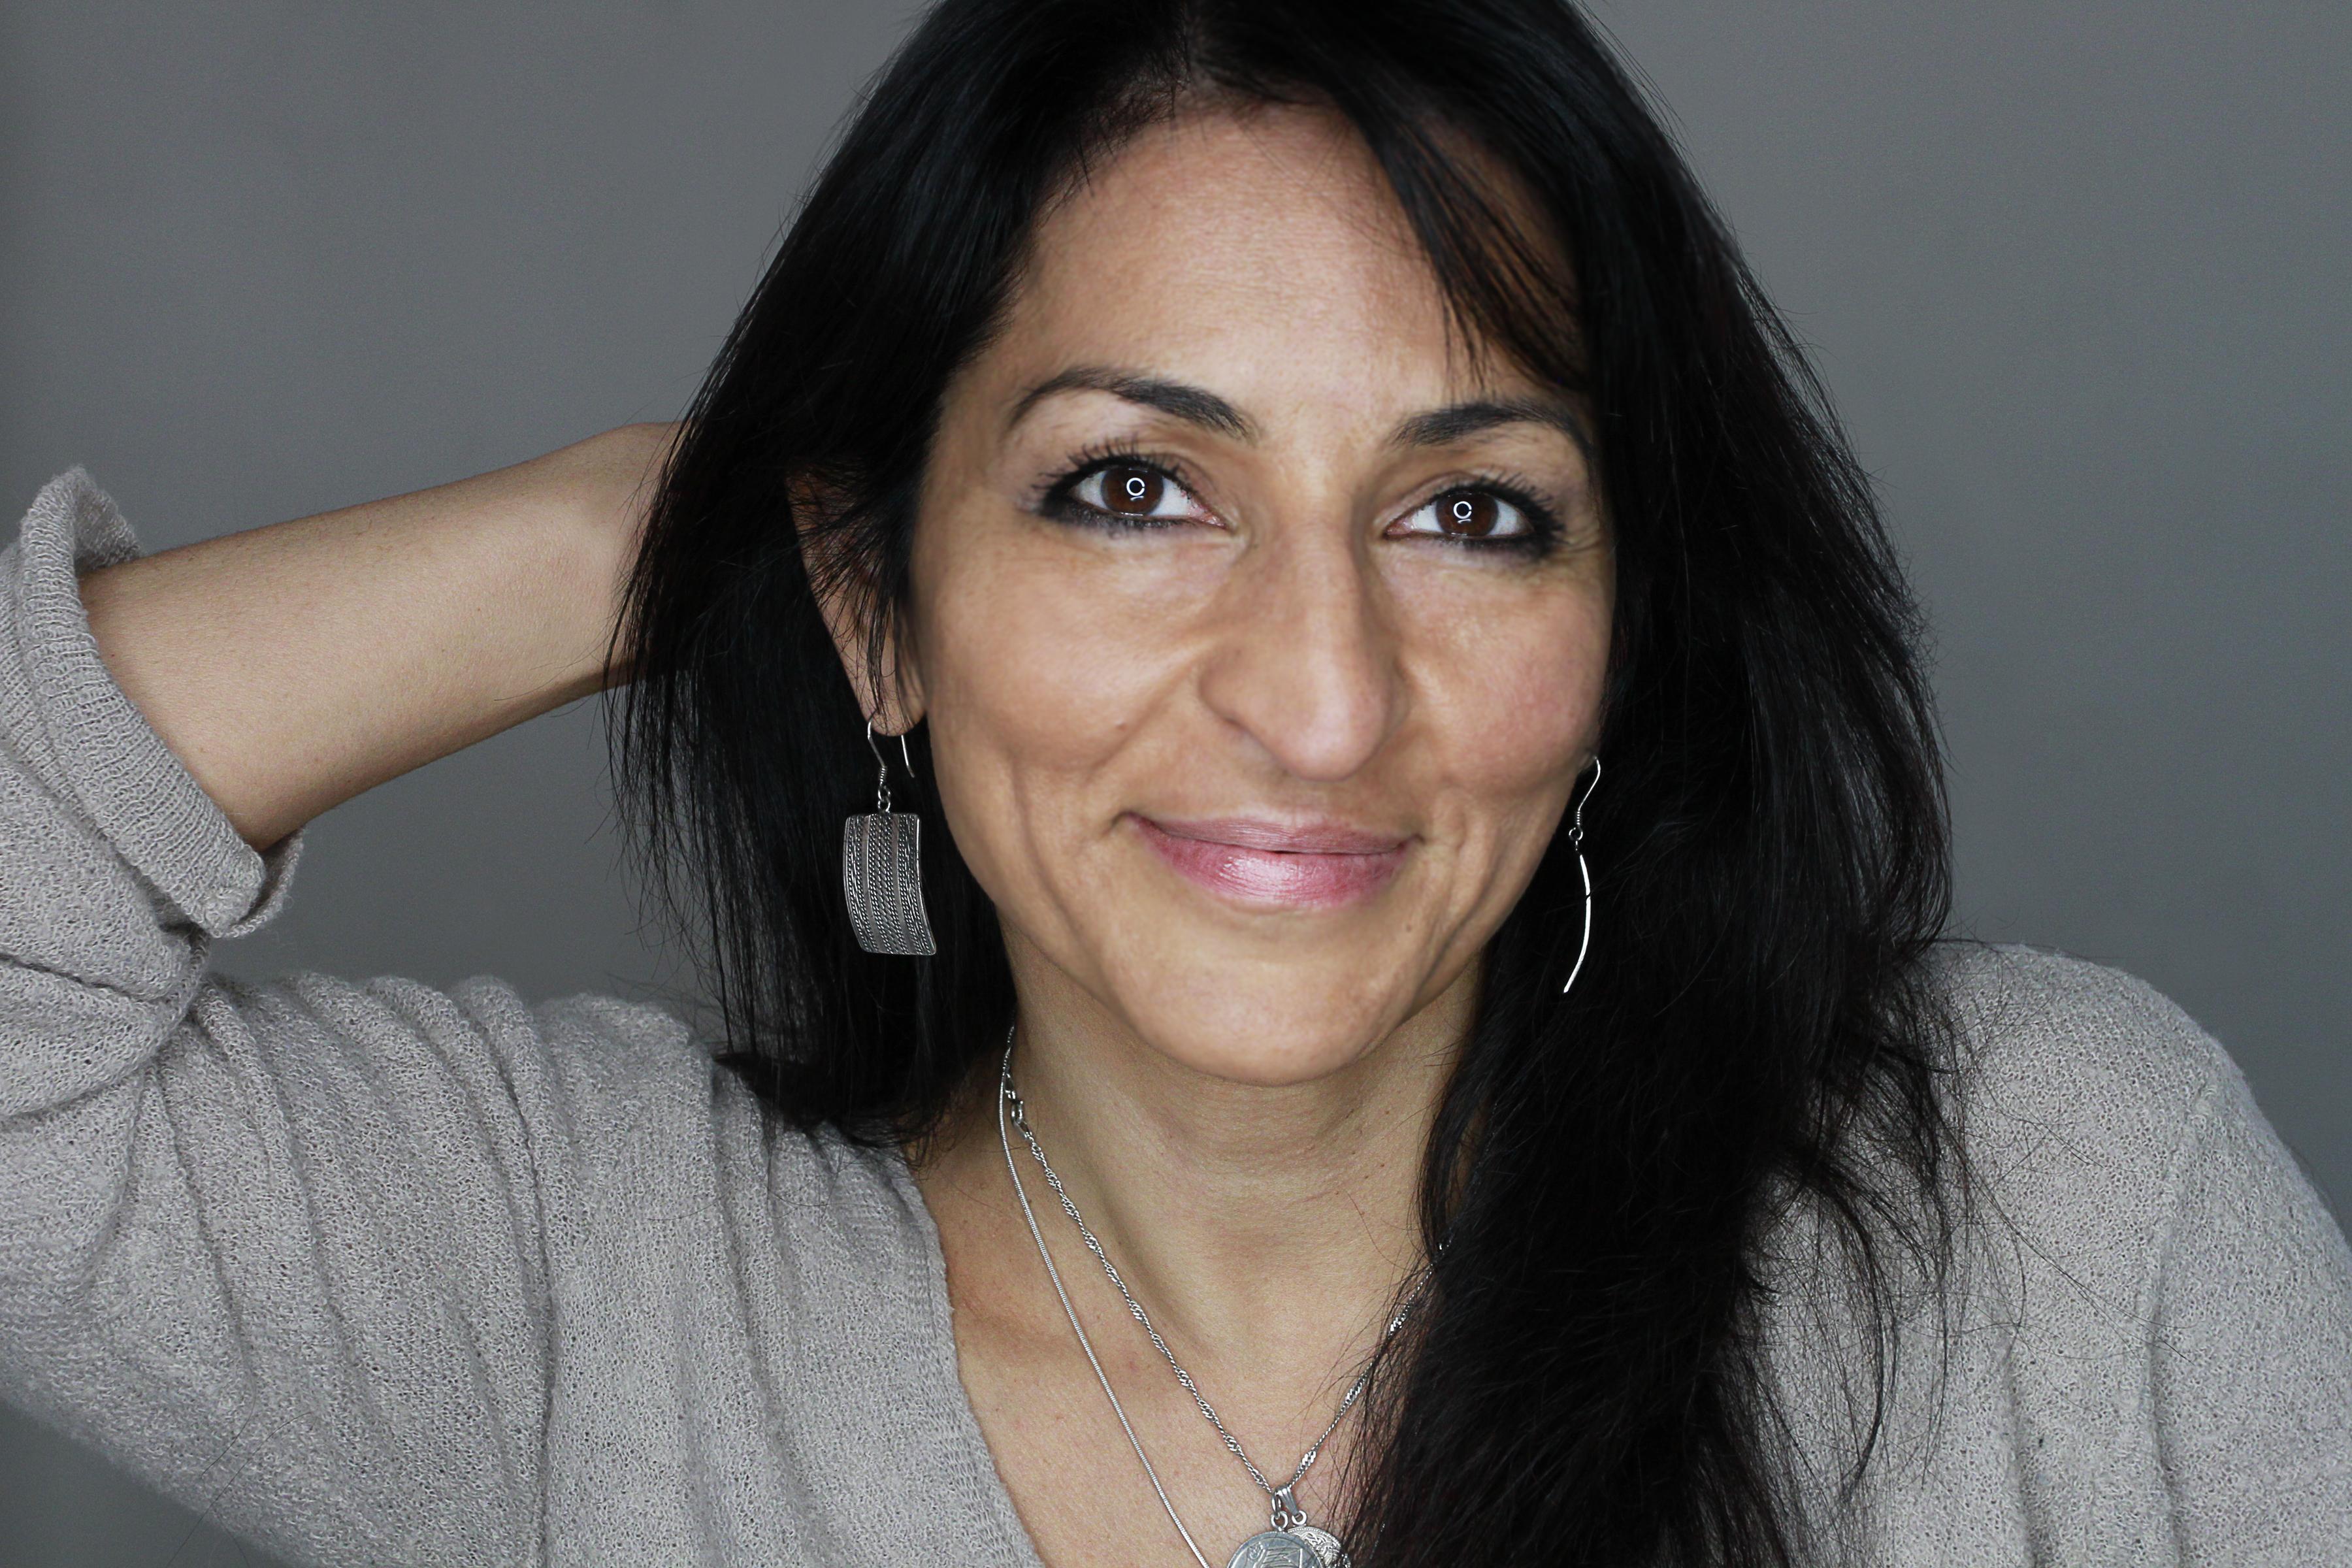 Susan Abulhawa: Love and suffering in Gaza - Qantara.de...